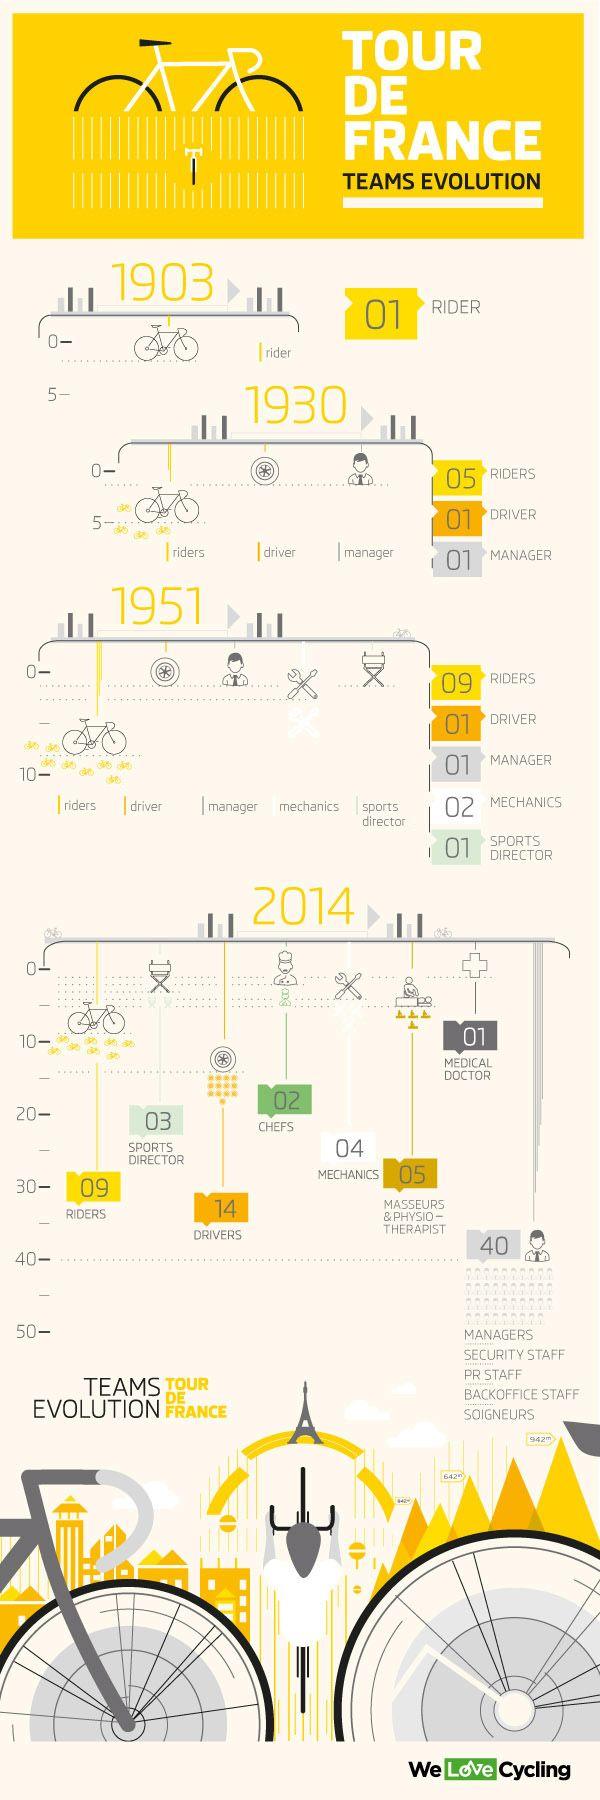 Tour de France Teams Evolution | Cycling Magazine